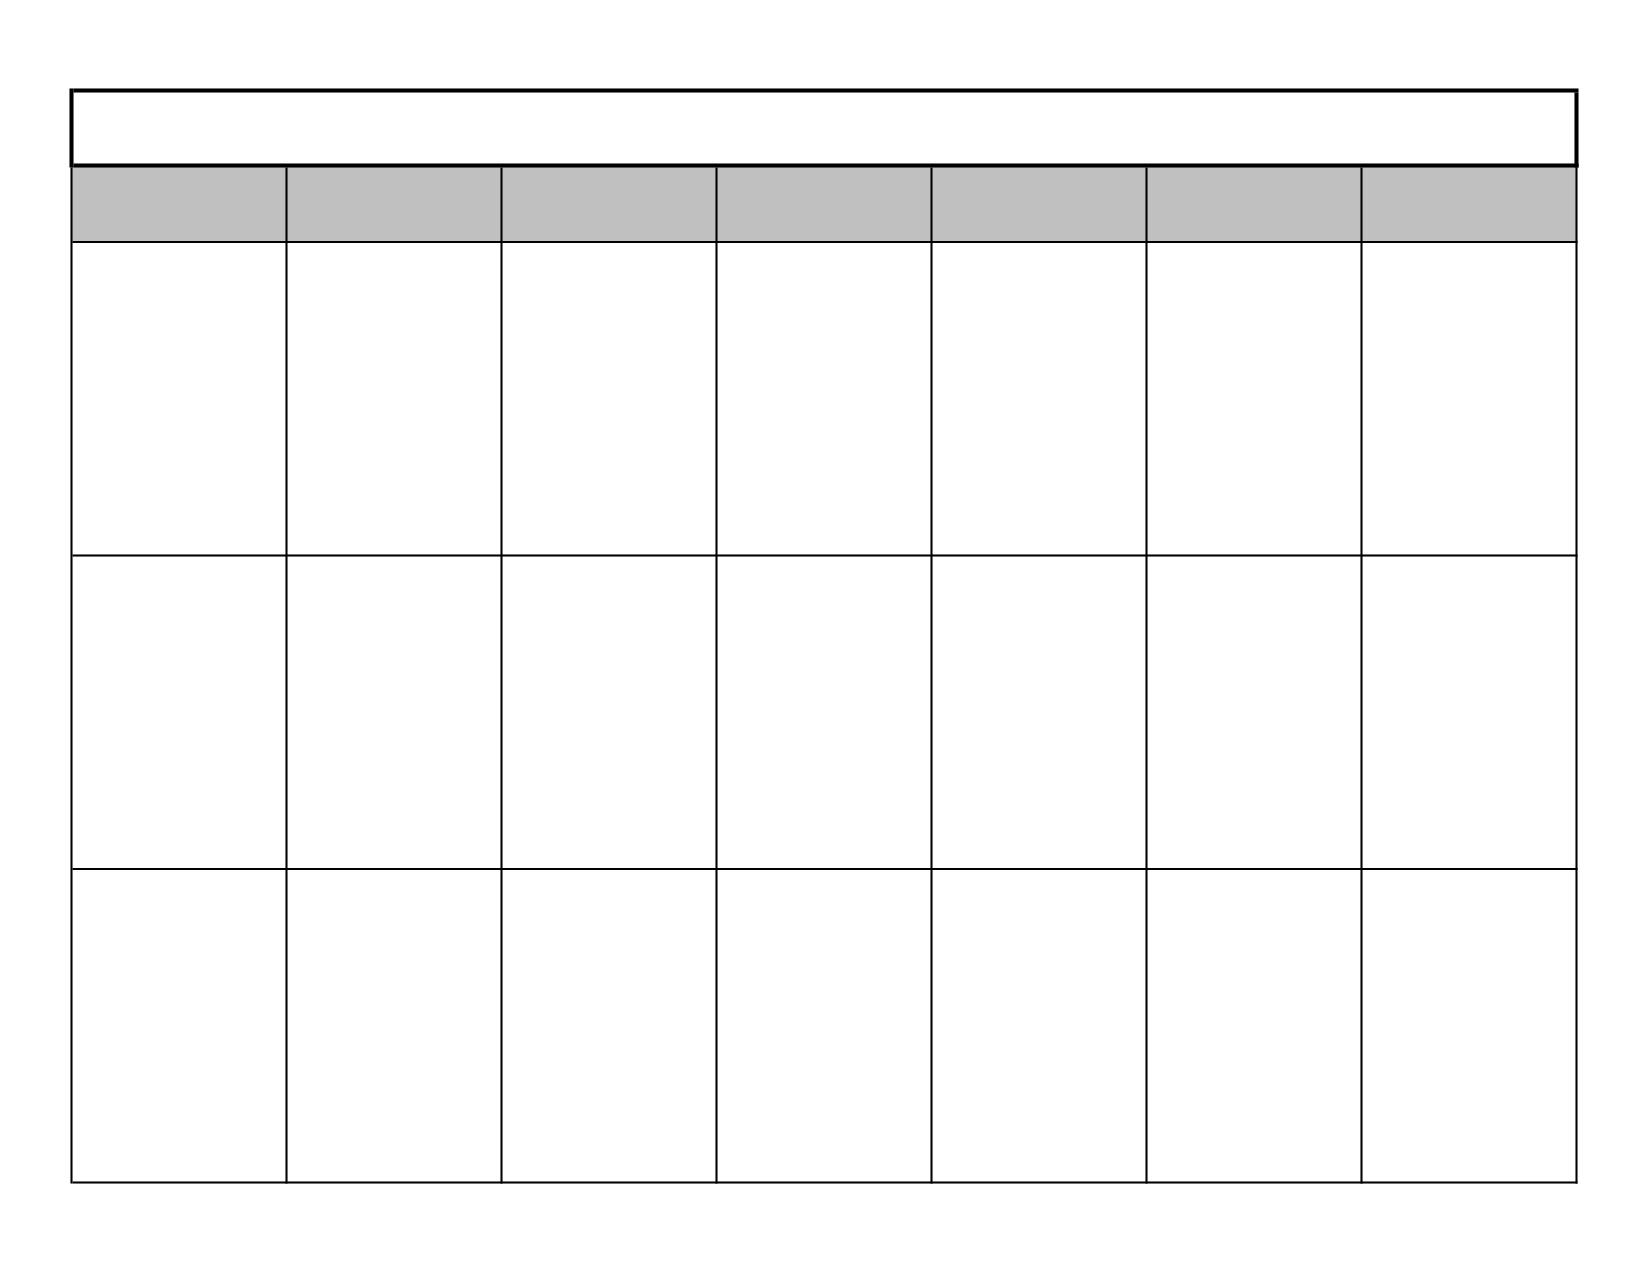 16 Blank Printable Weekly Calendars Templates Images - Blank within Blank Weekly Calendar Print Outs